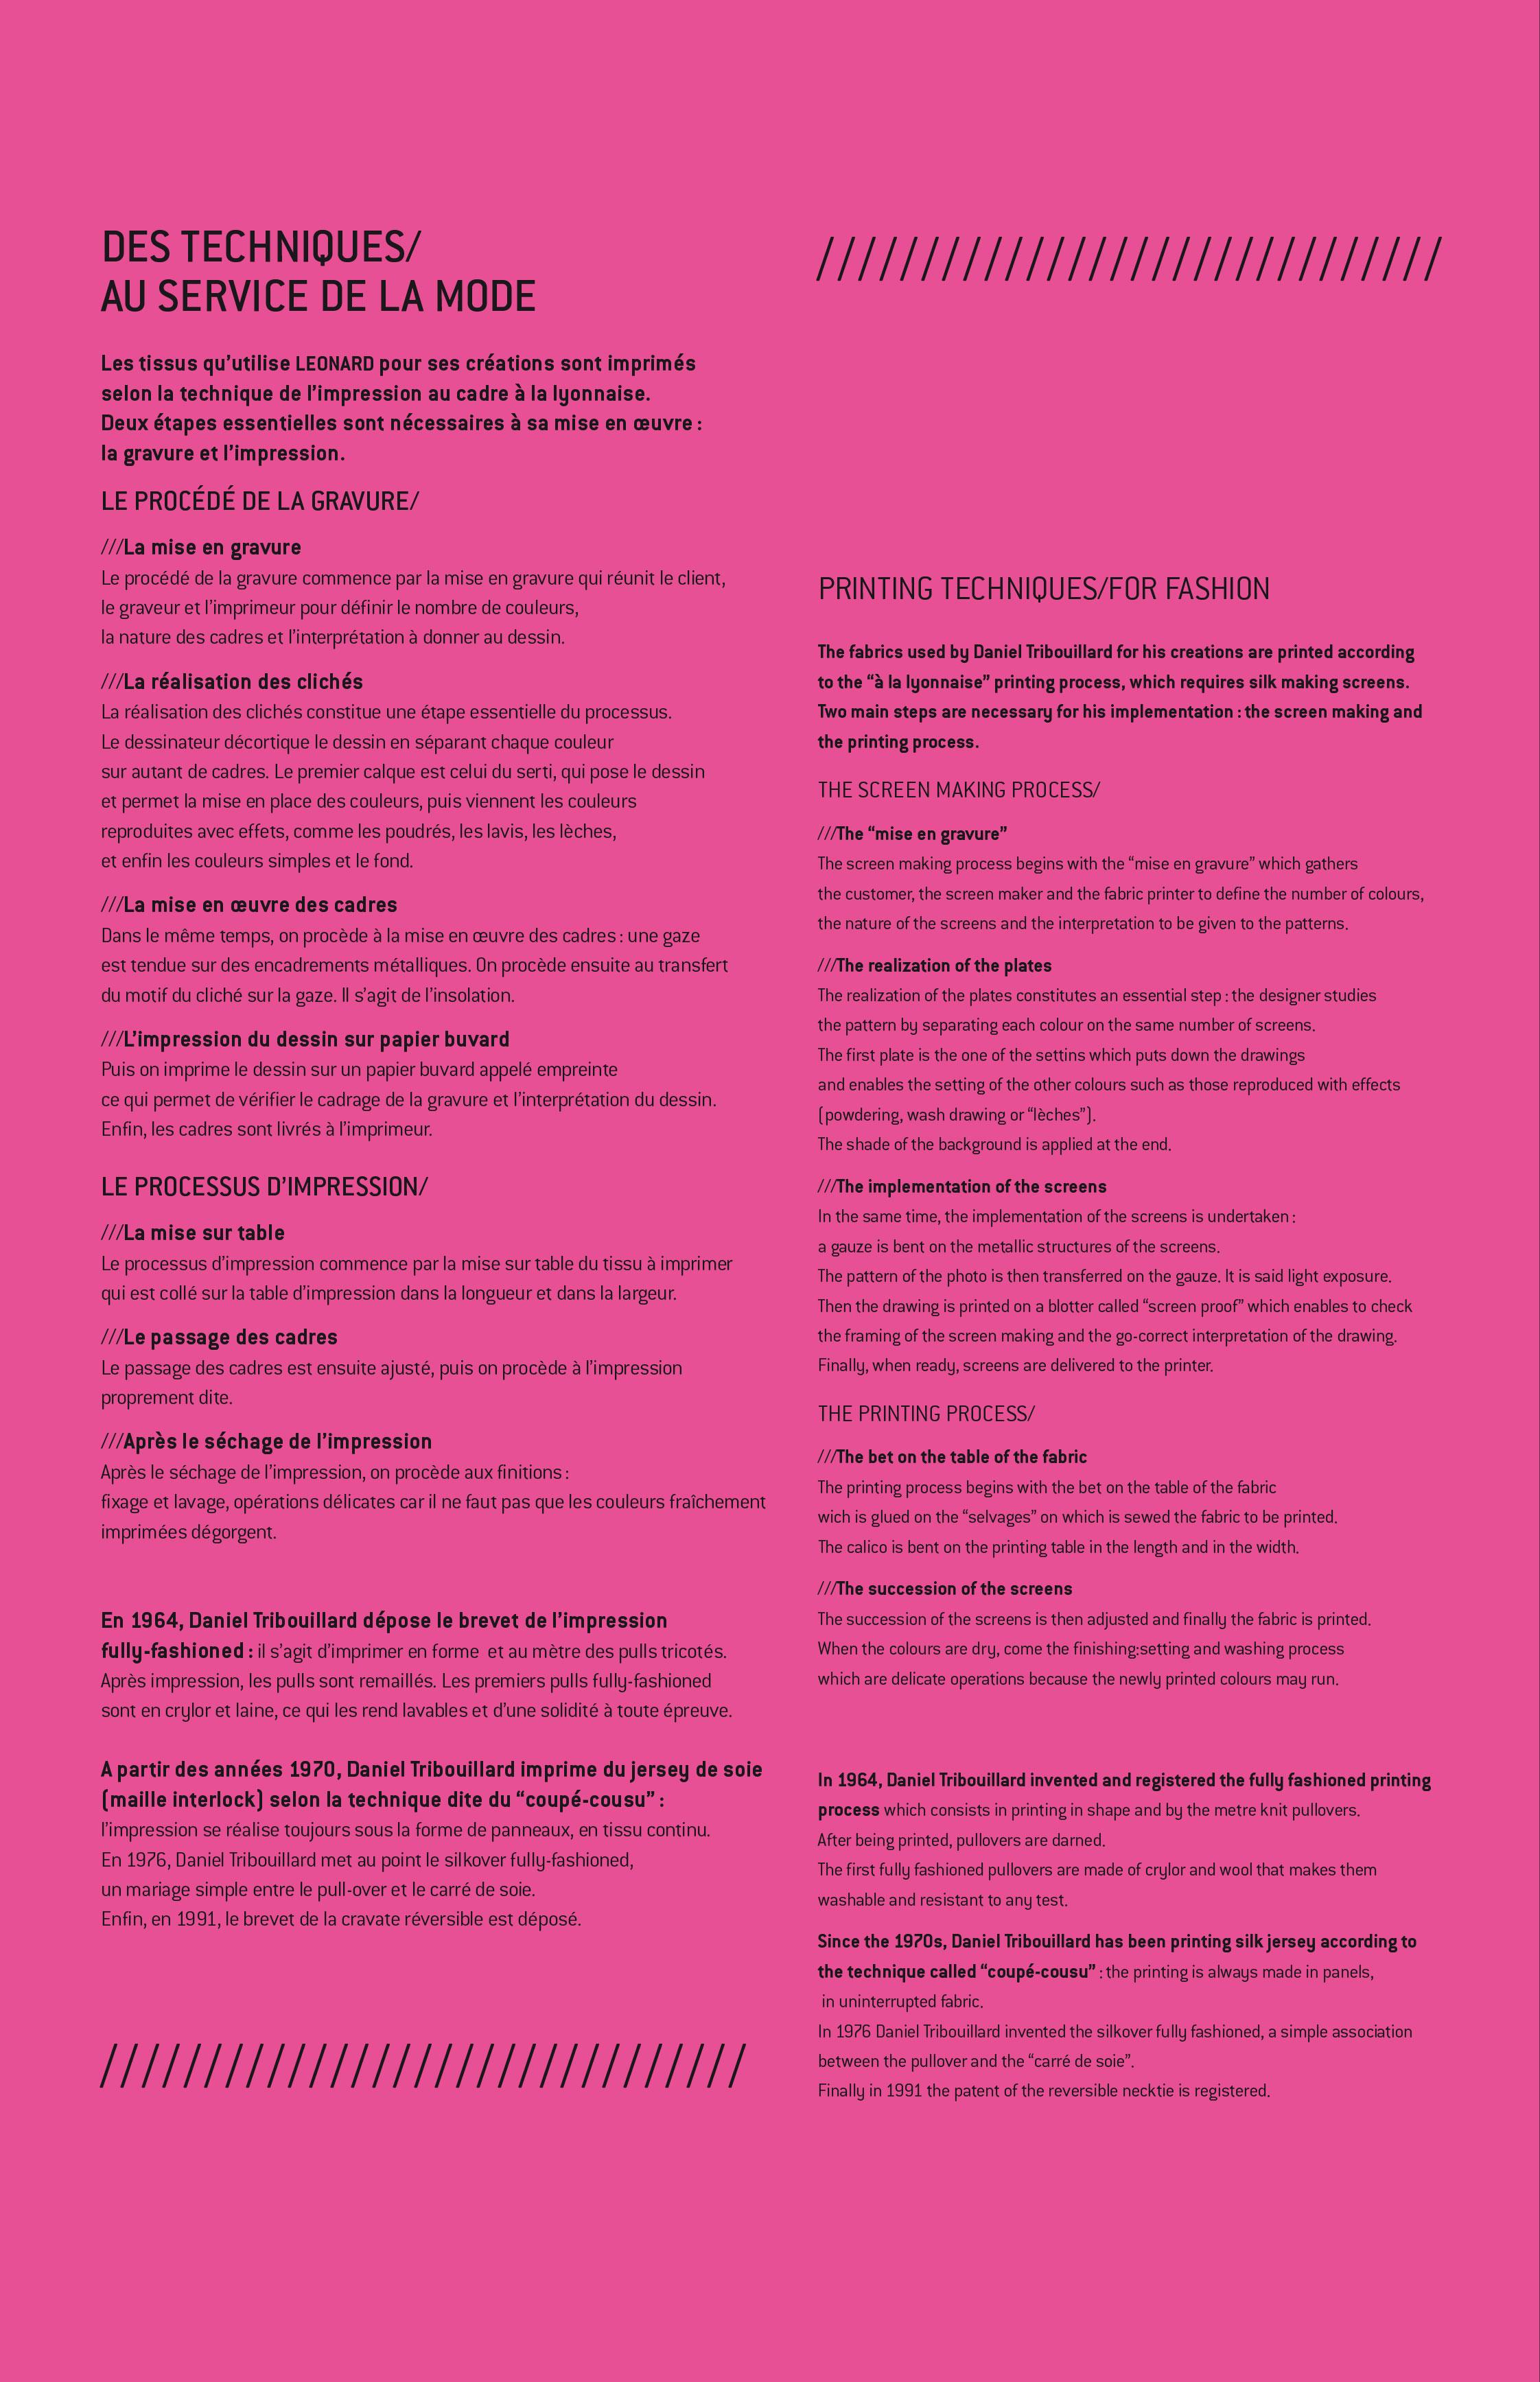 expositions-leonard-03